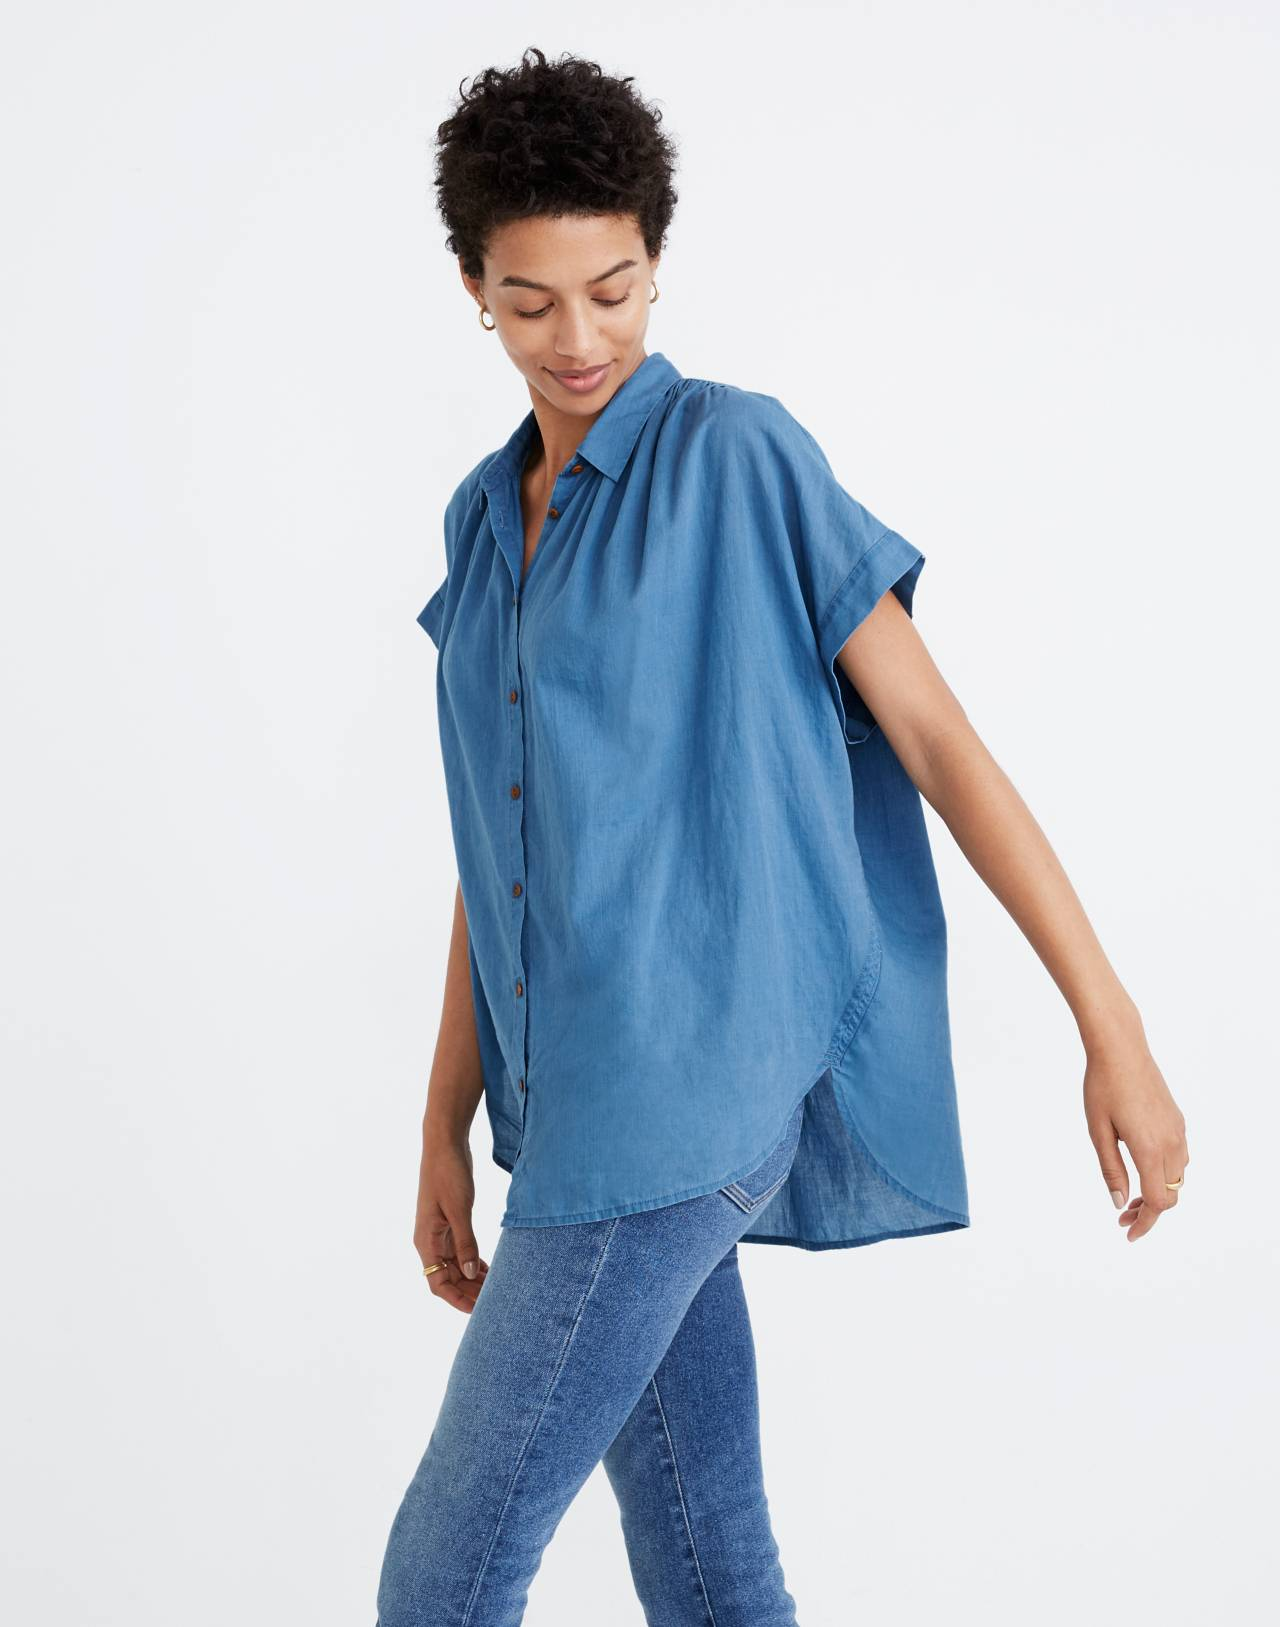 Central Shirt in Bright Indigo in bright indigo image 2